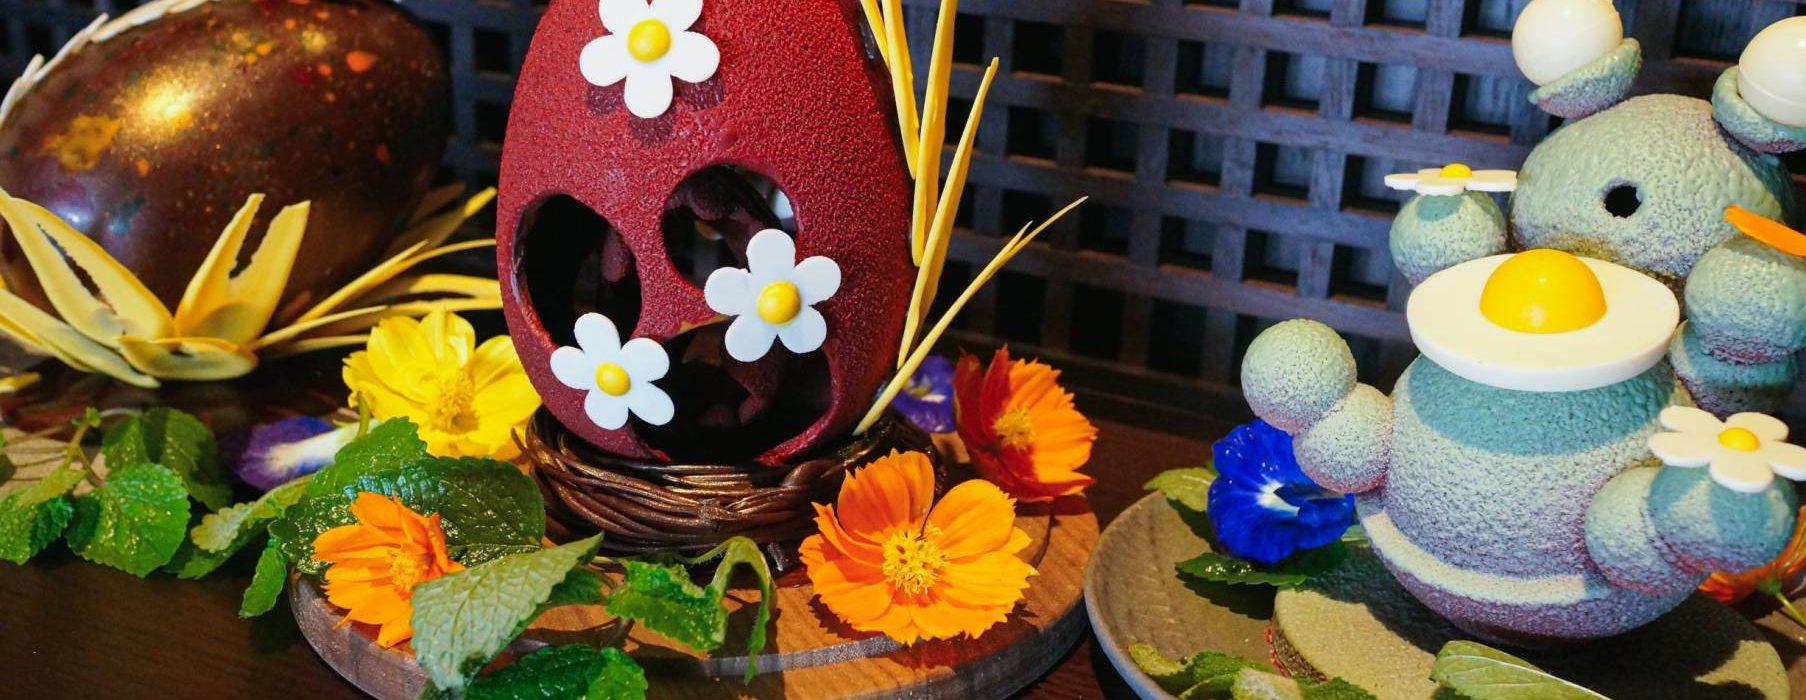 Raffles Bali - Celebrate the Festivities of Easter at Raffles Bali